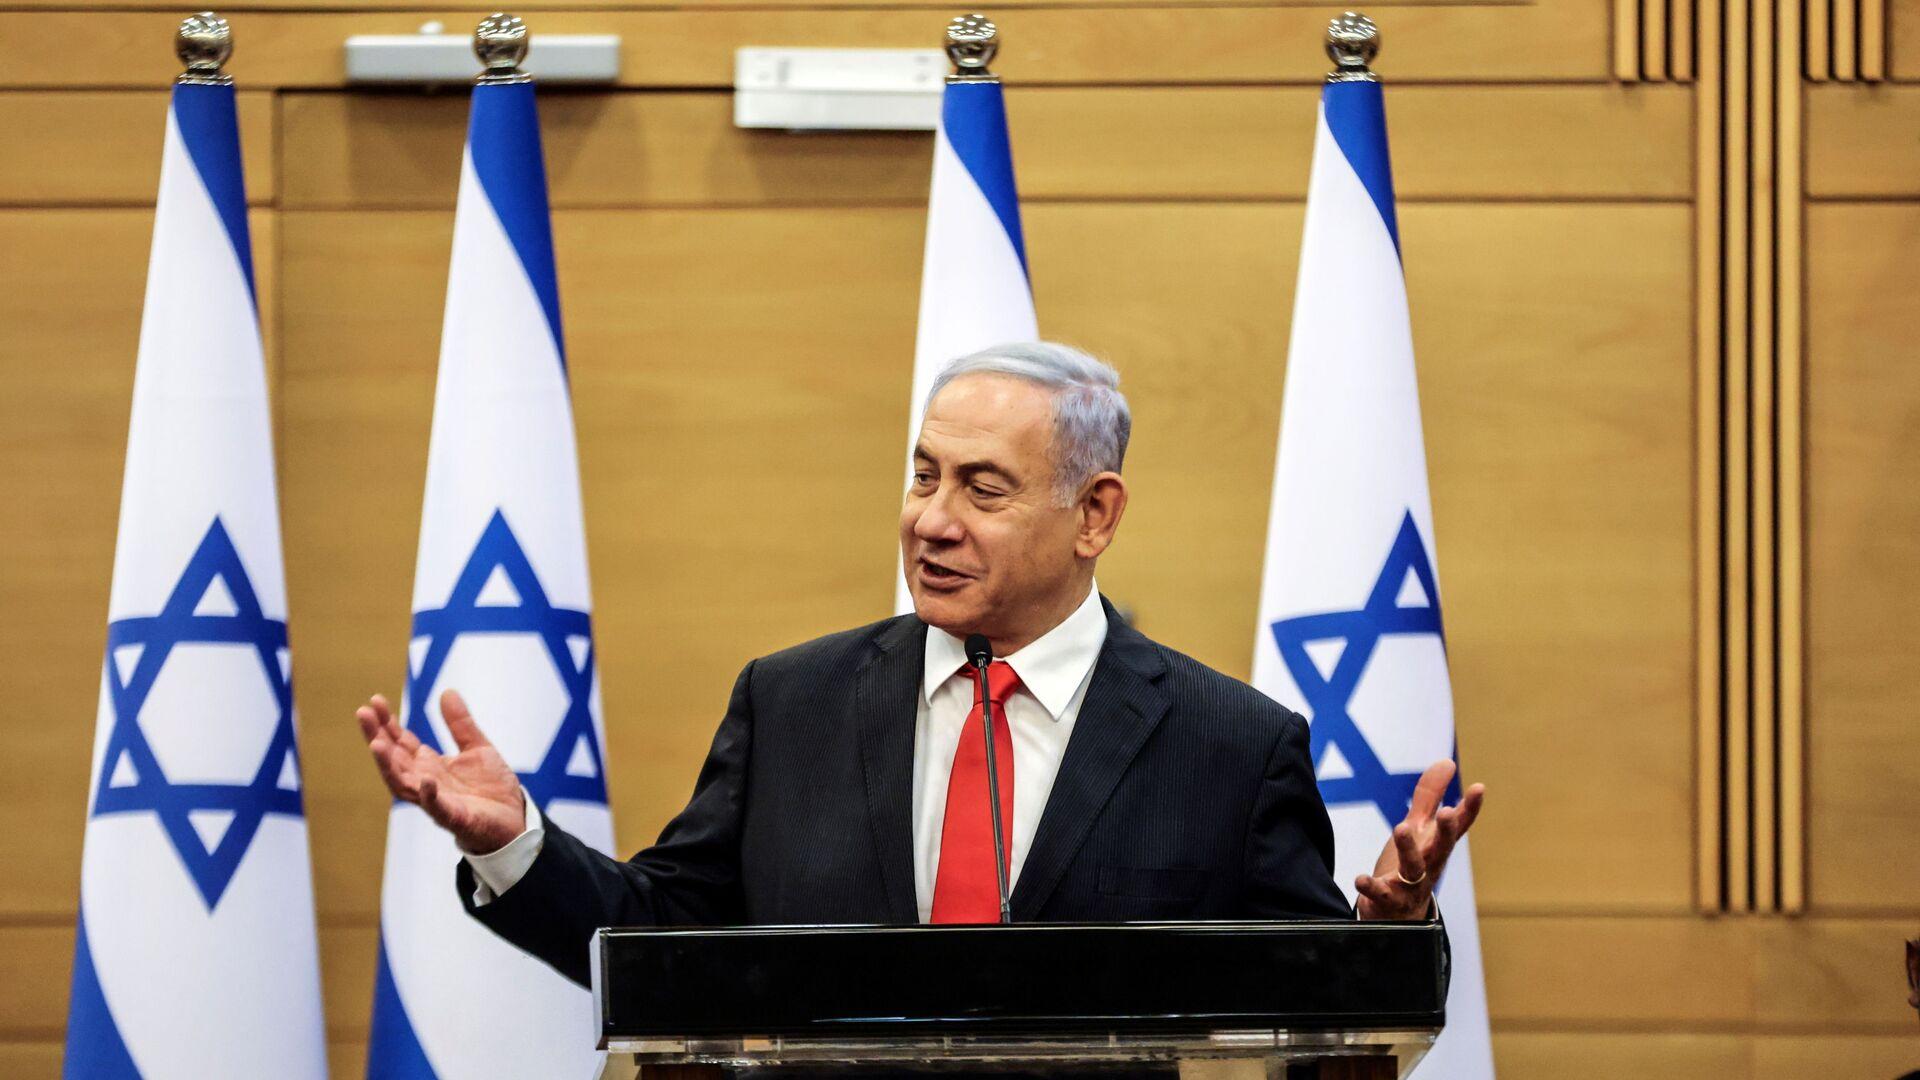 Leader of Israeli Opposition Benjamin Netanyahu speaks during a meeting with his Likud party in the Knesset, the Israeli parliament, in Jerusalem June 14, 2021.  - Sputnik International, 1920, 20.09.2021